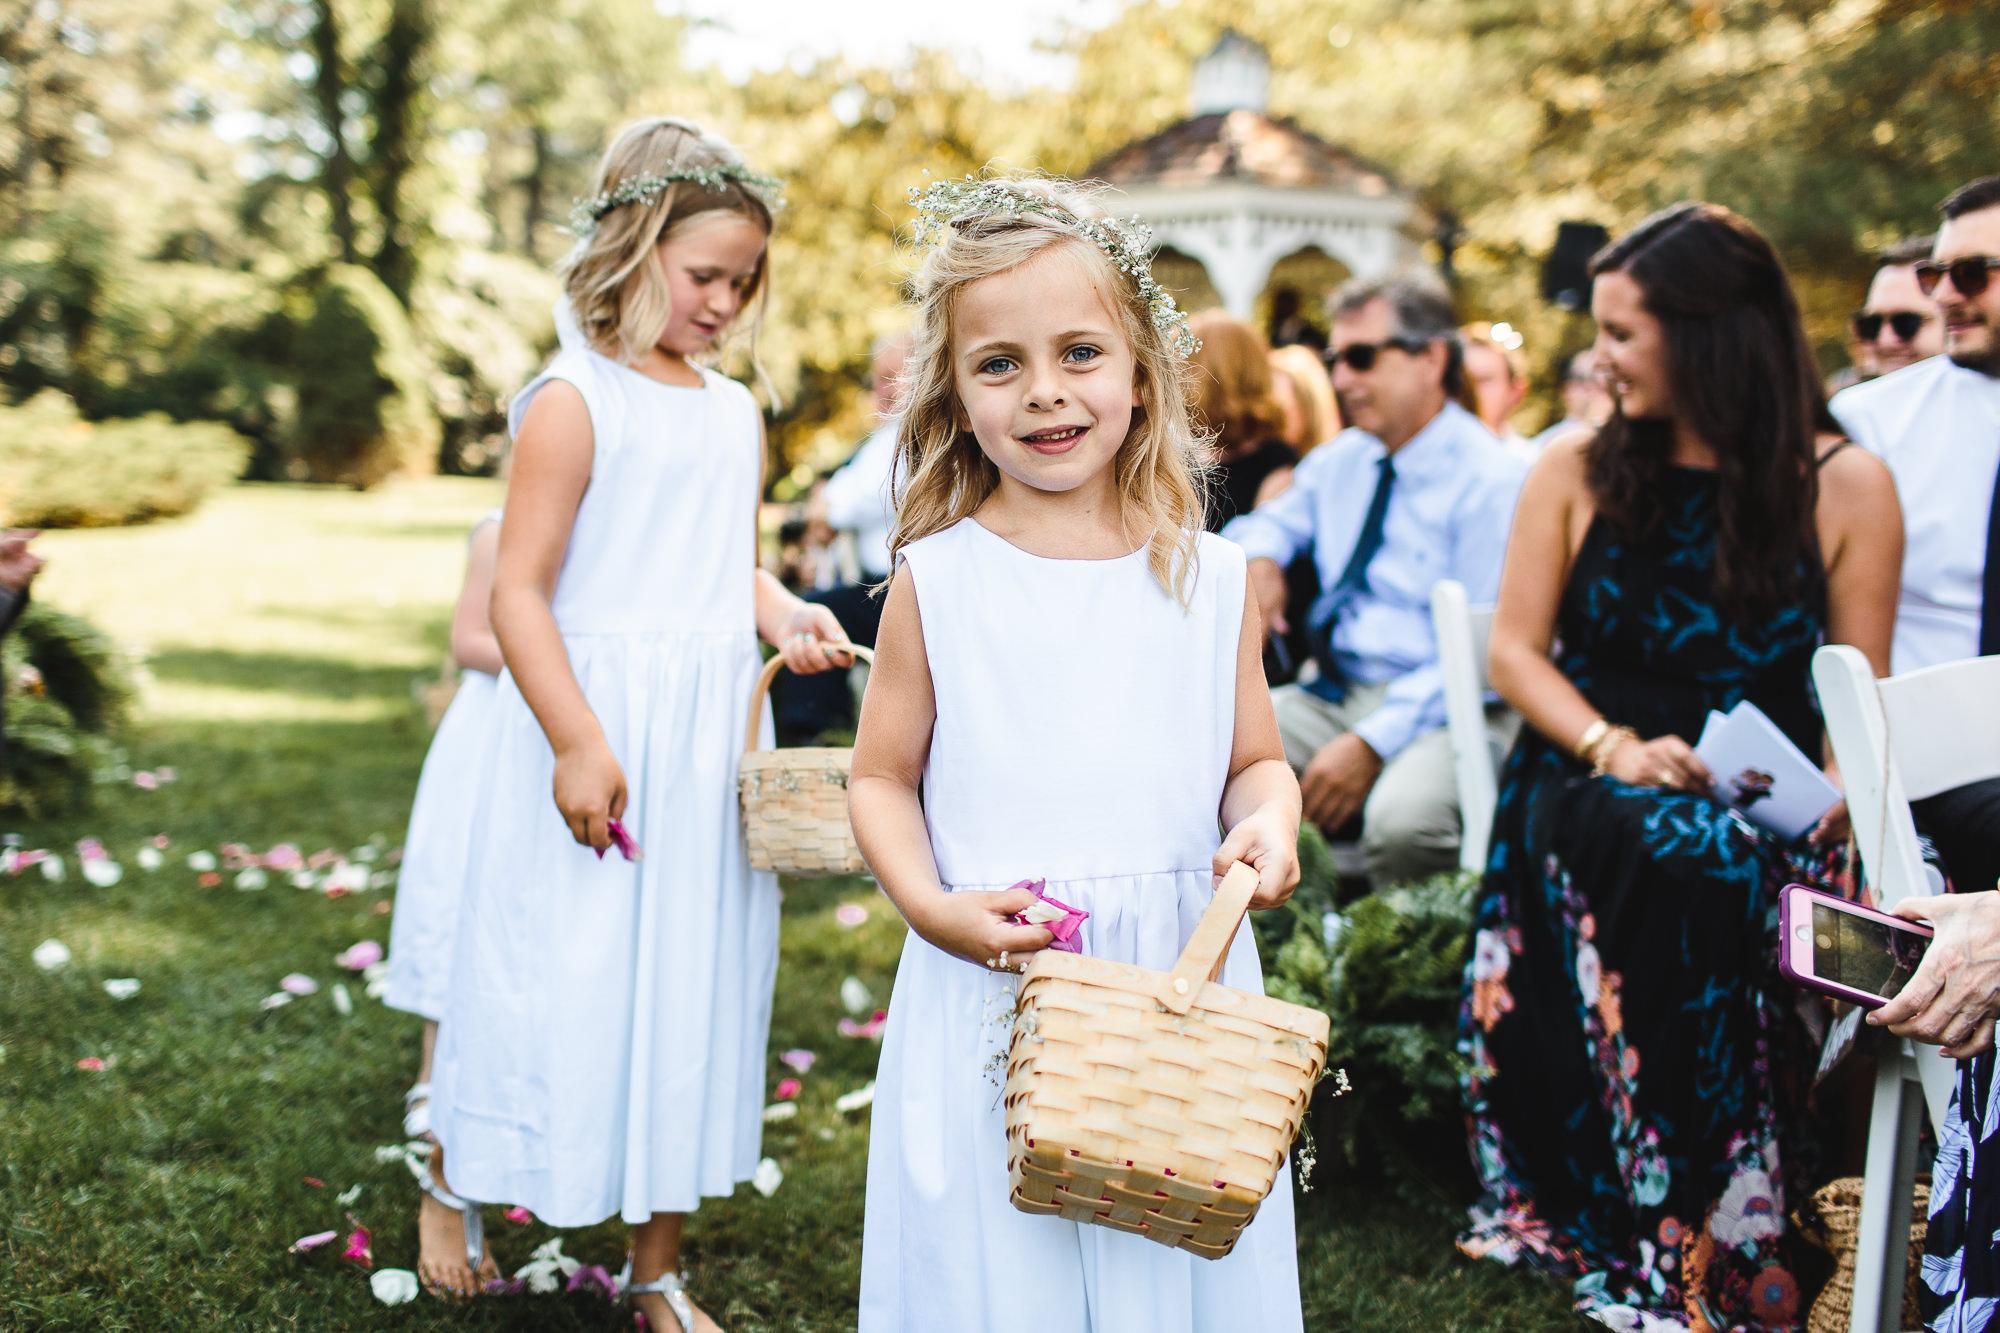 connecticut-summer-lake-wedding-emily-kirke-photography-upstyle (83 of 181).jpg